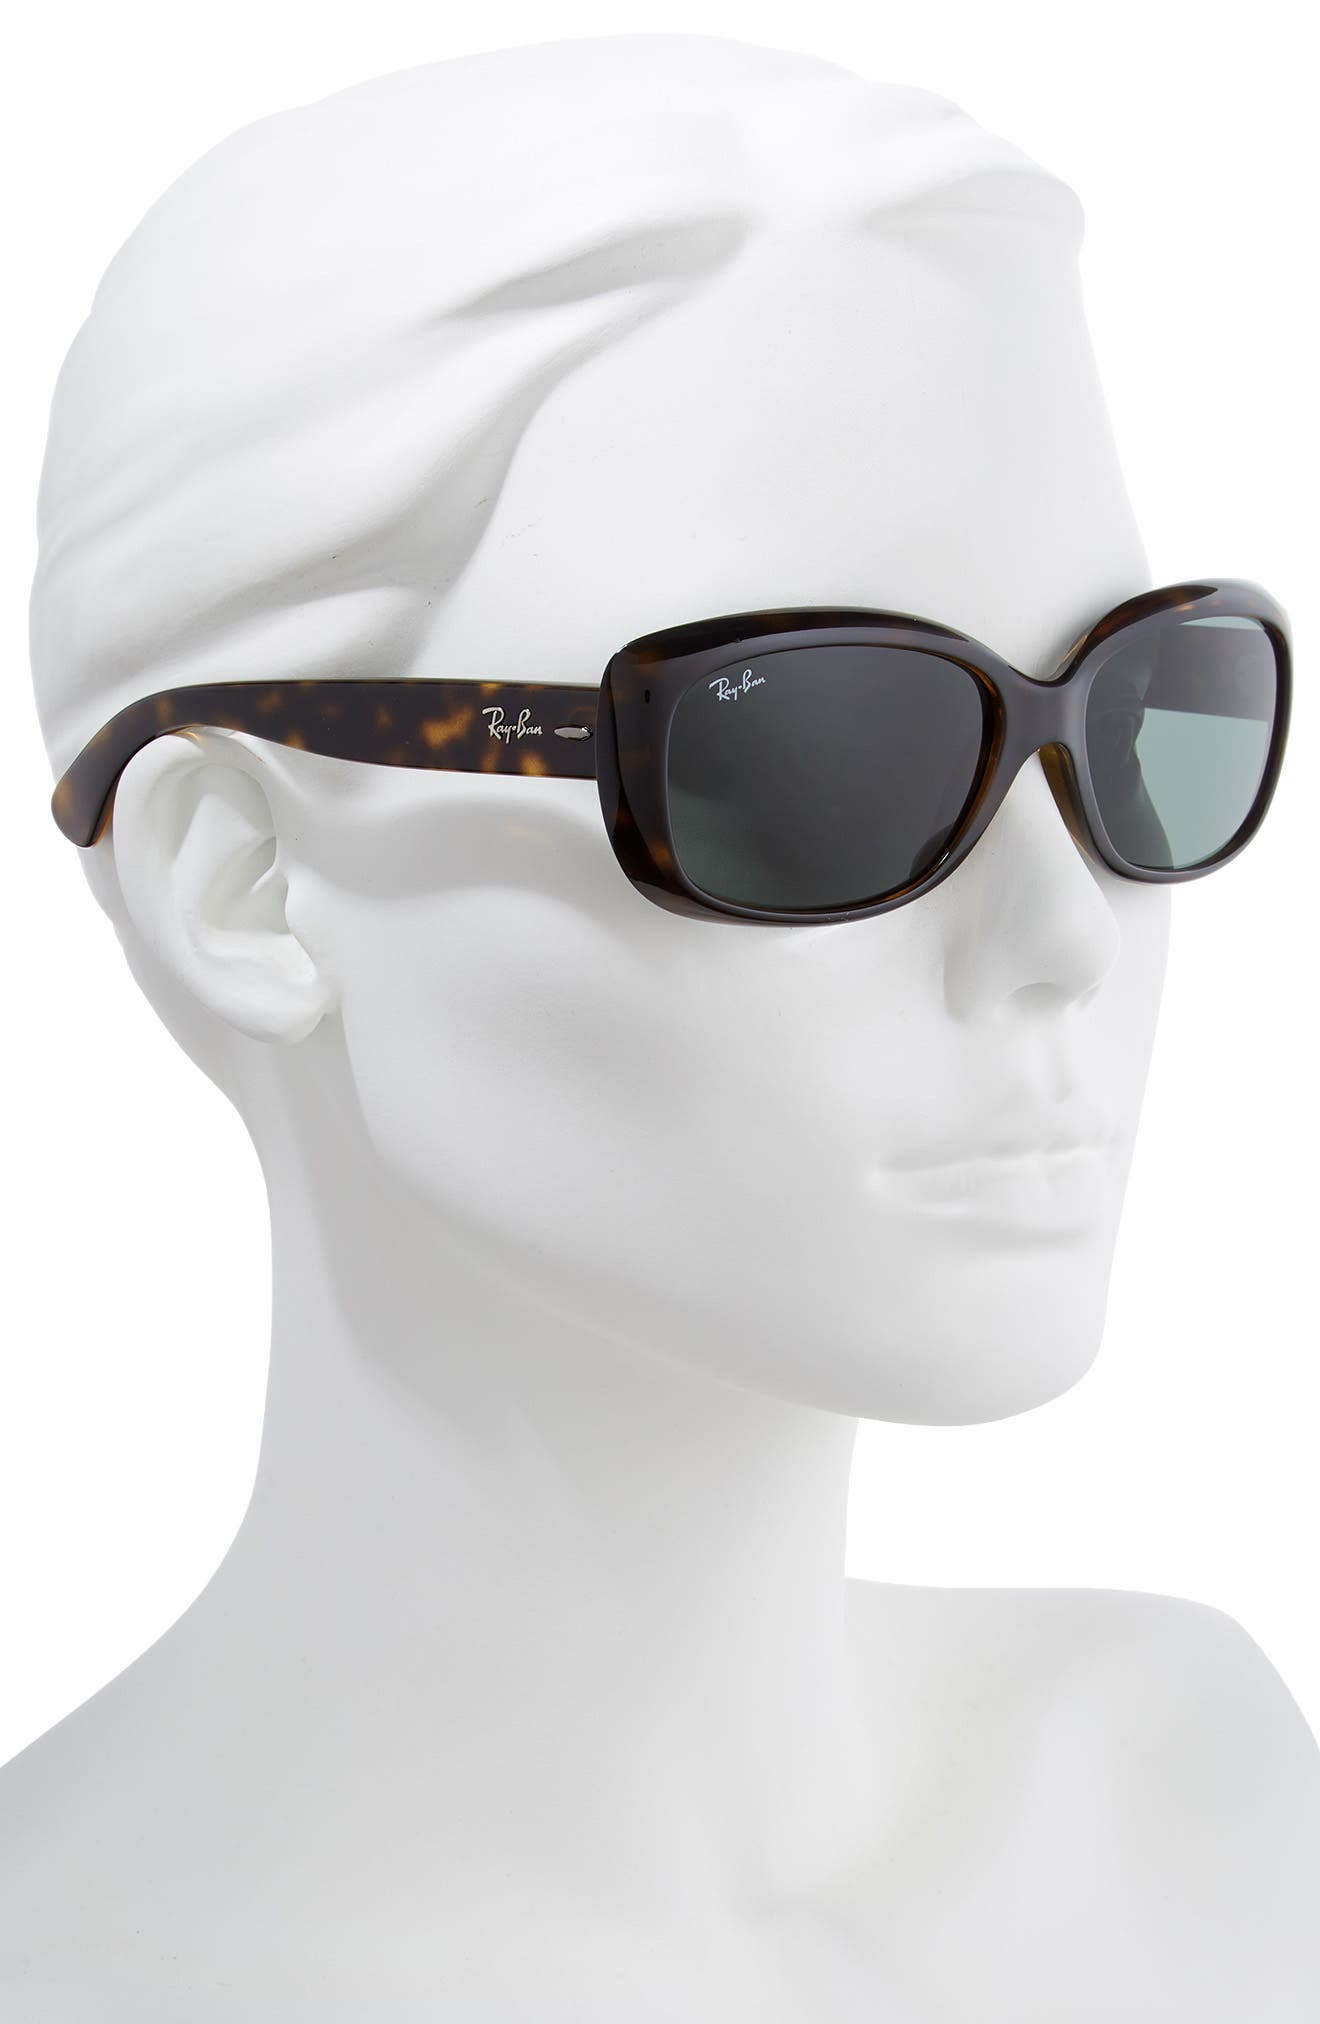 RAY-BAN, Jackie Ohh 58mm Cat Eye Sunglasses, Alternate thumbnail 2, color, LITE HAVANA/ GREEN SOLID